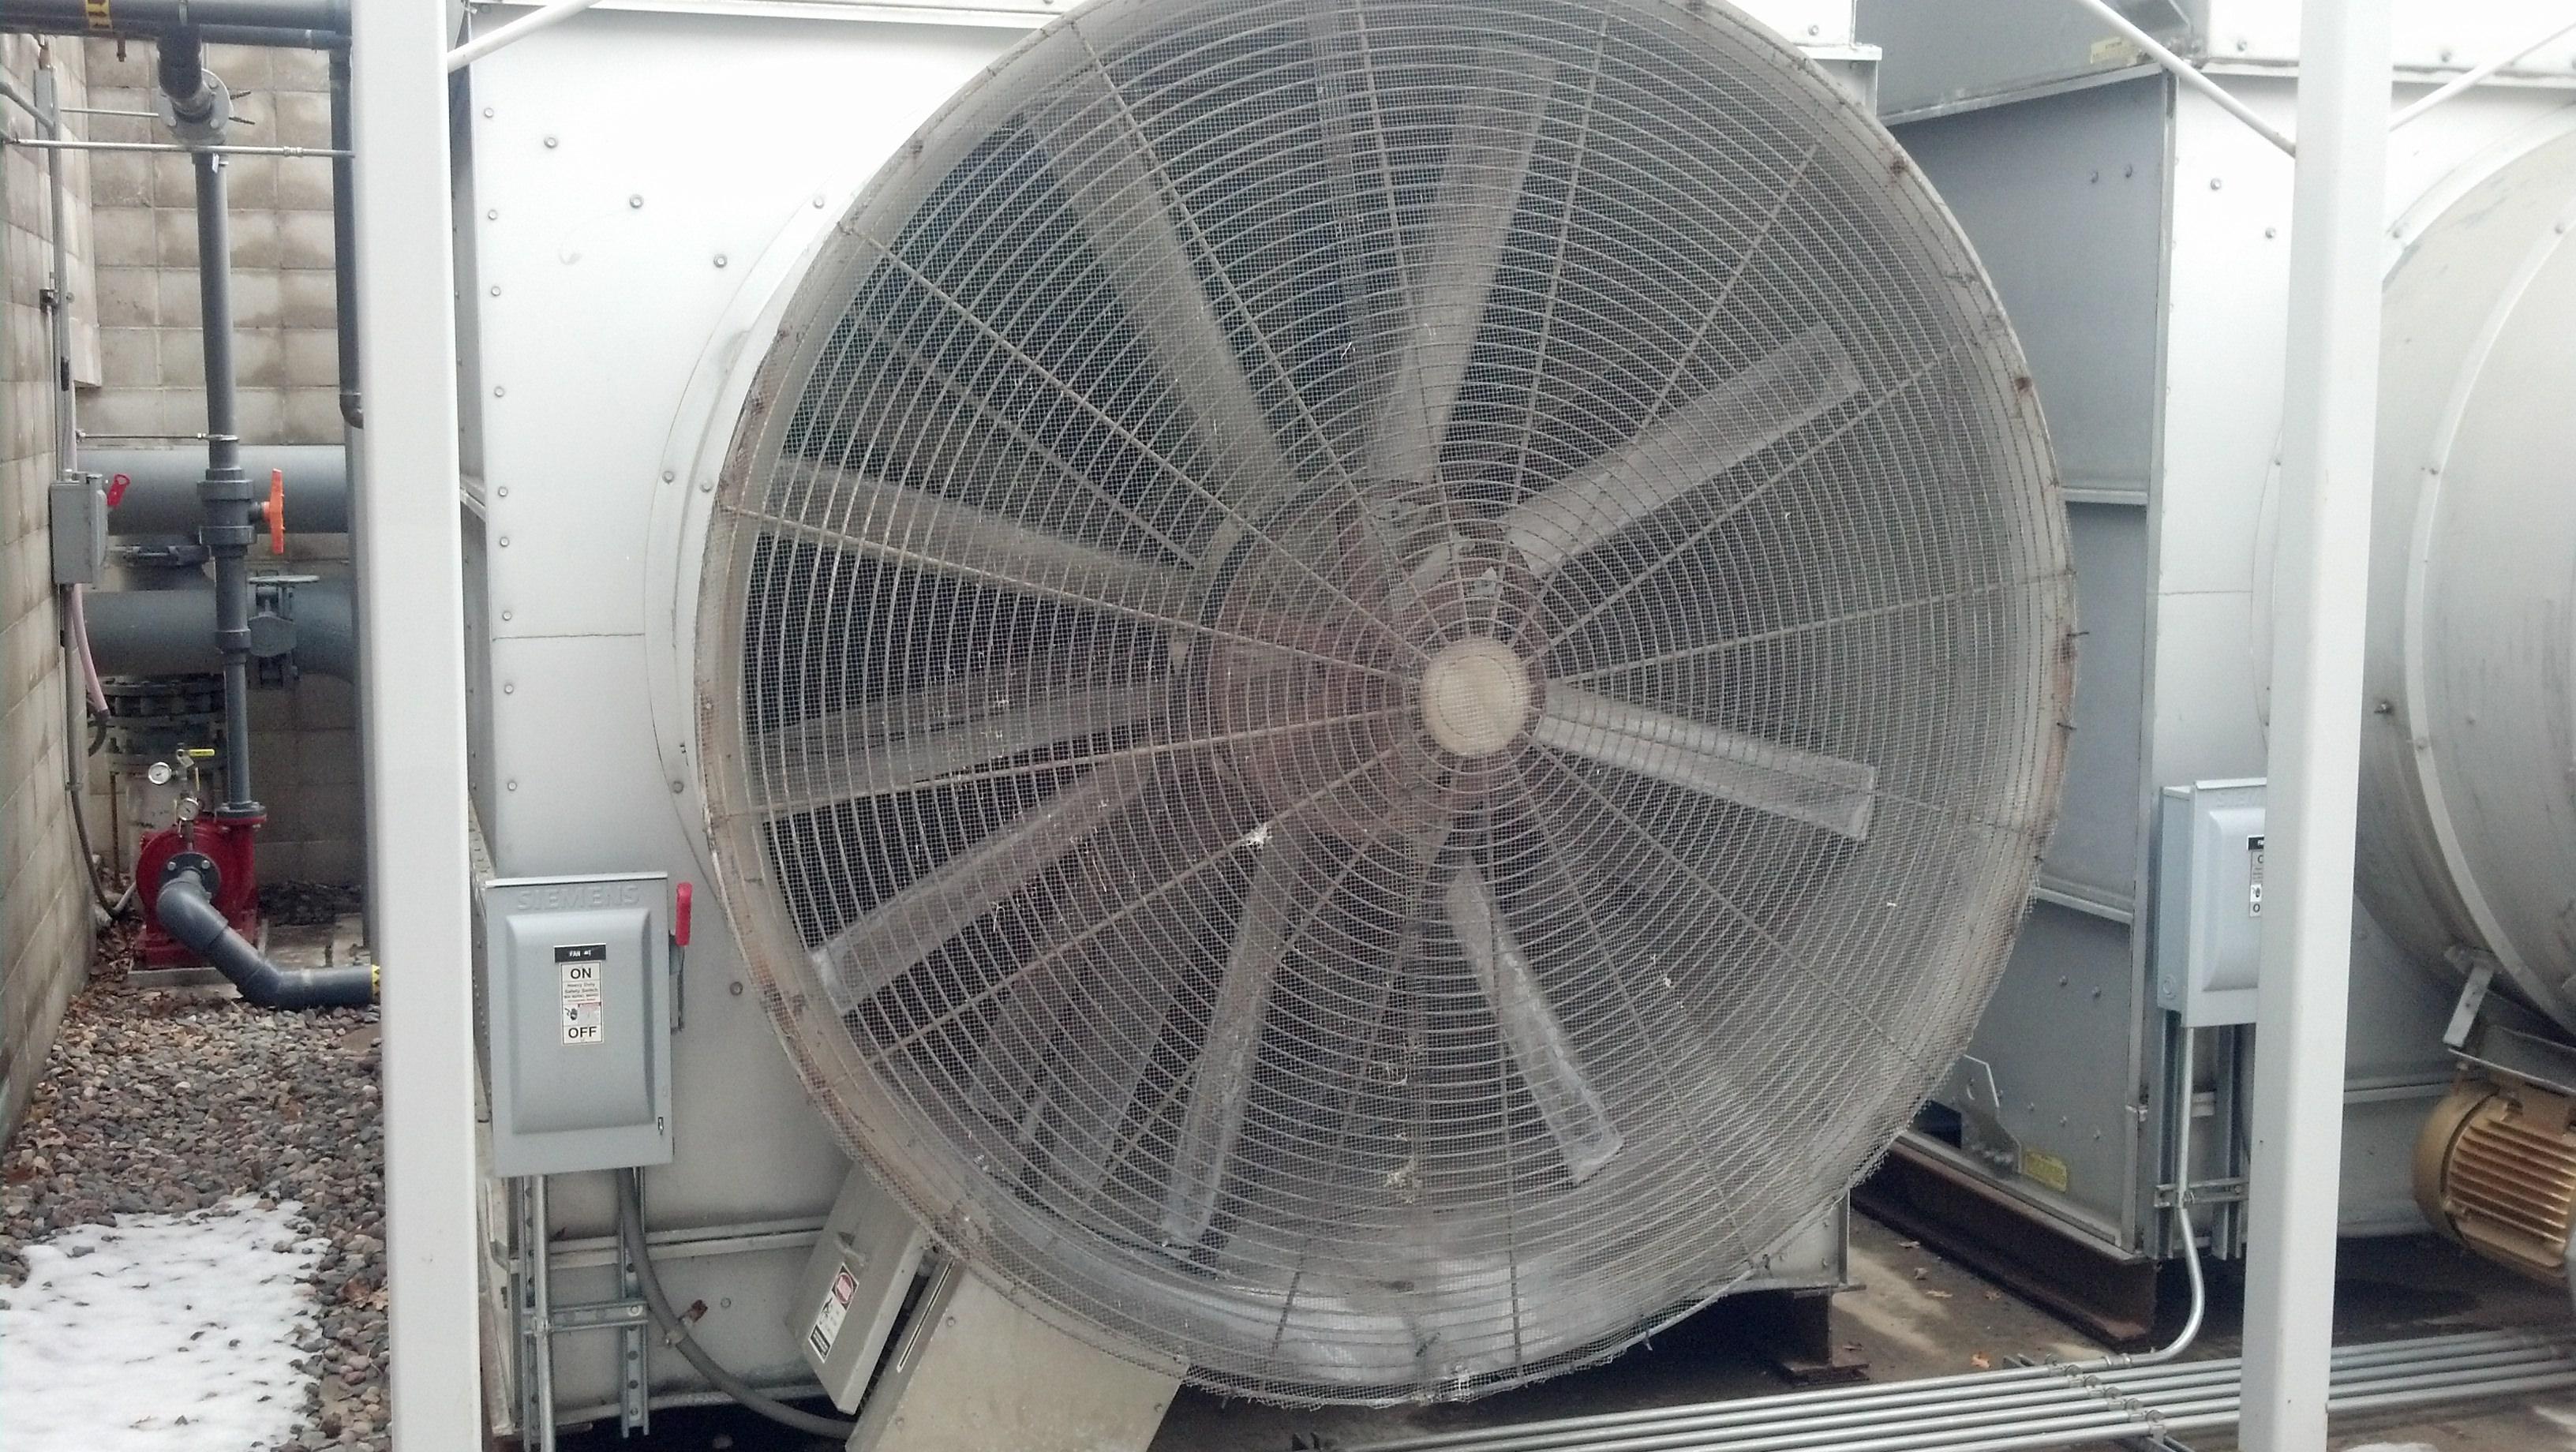 bac-cooling-tower-intake-fan